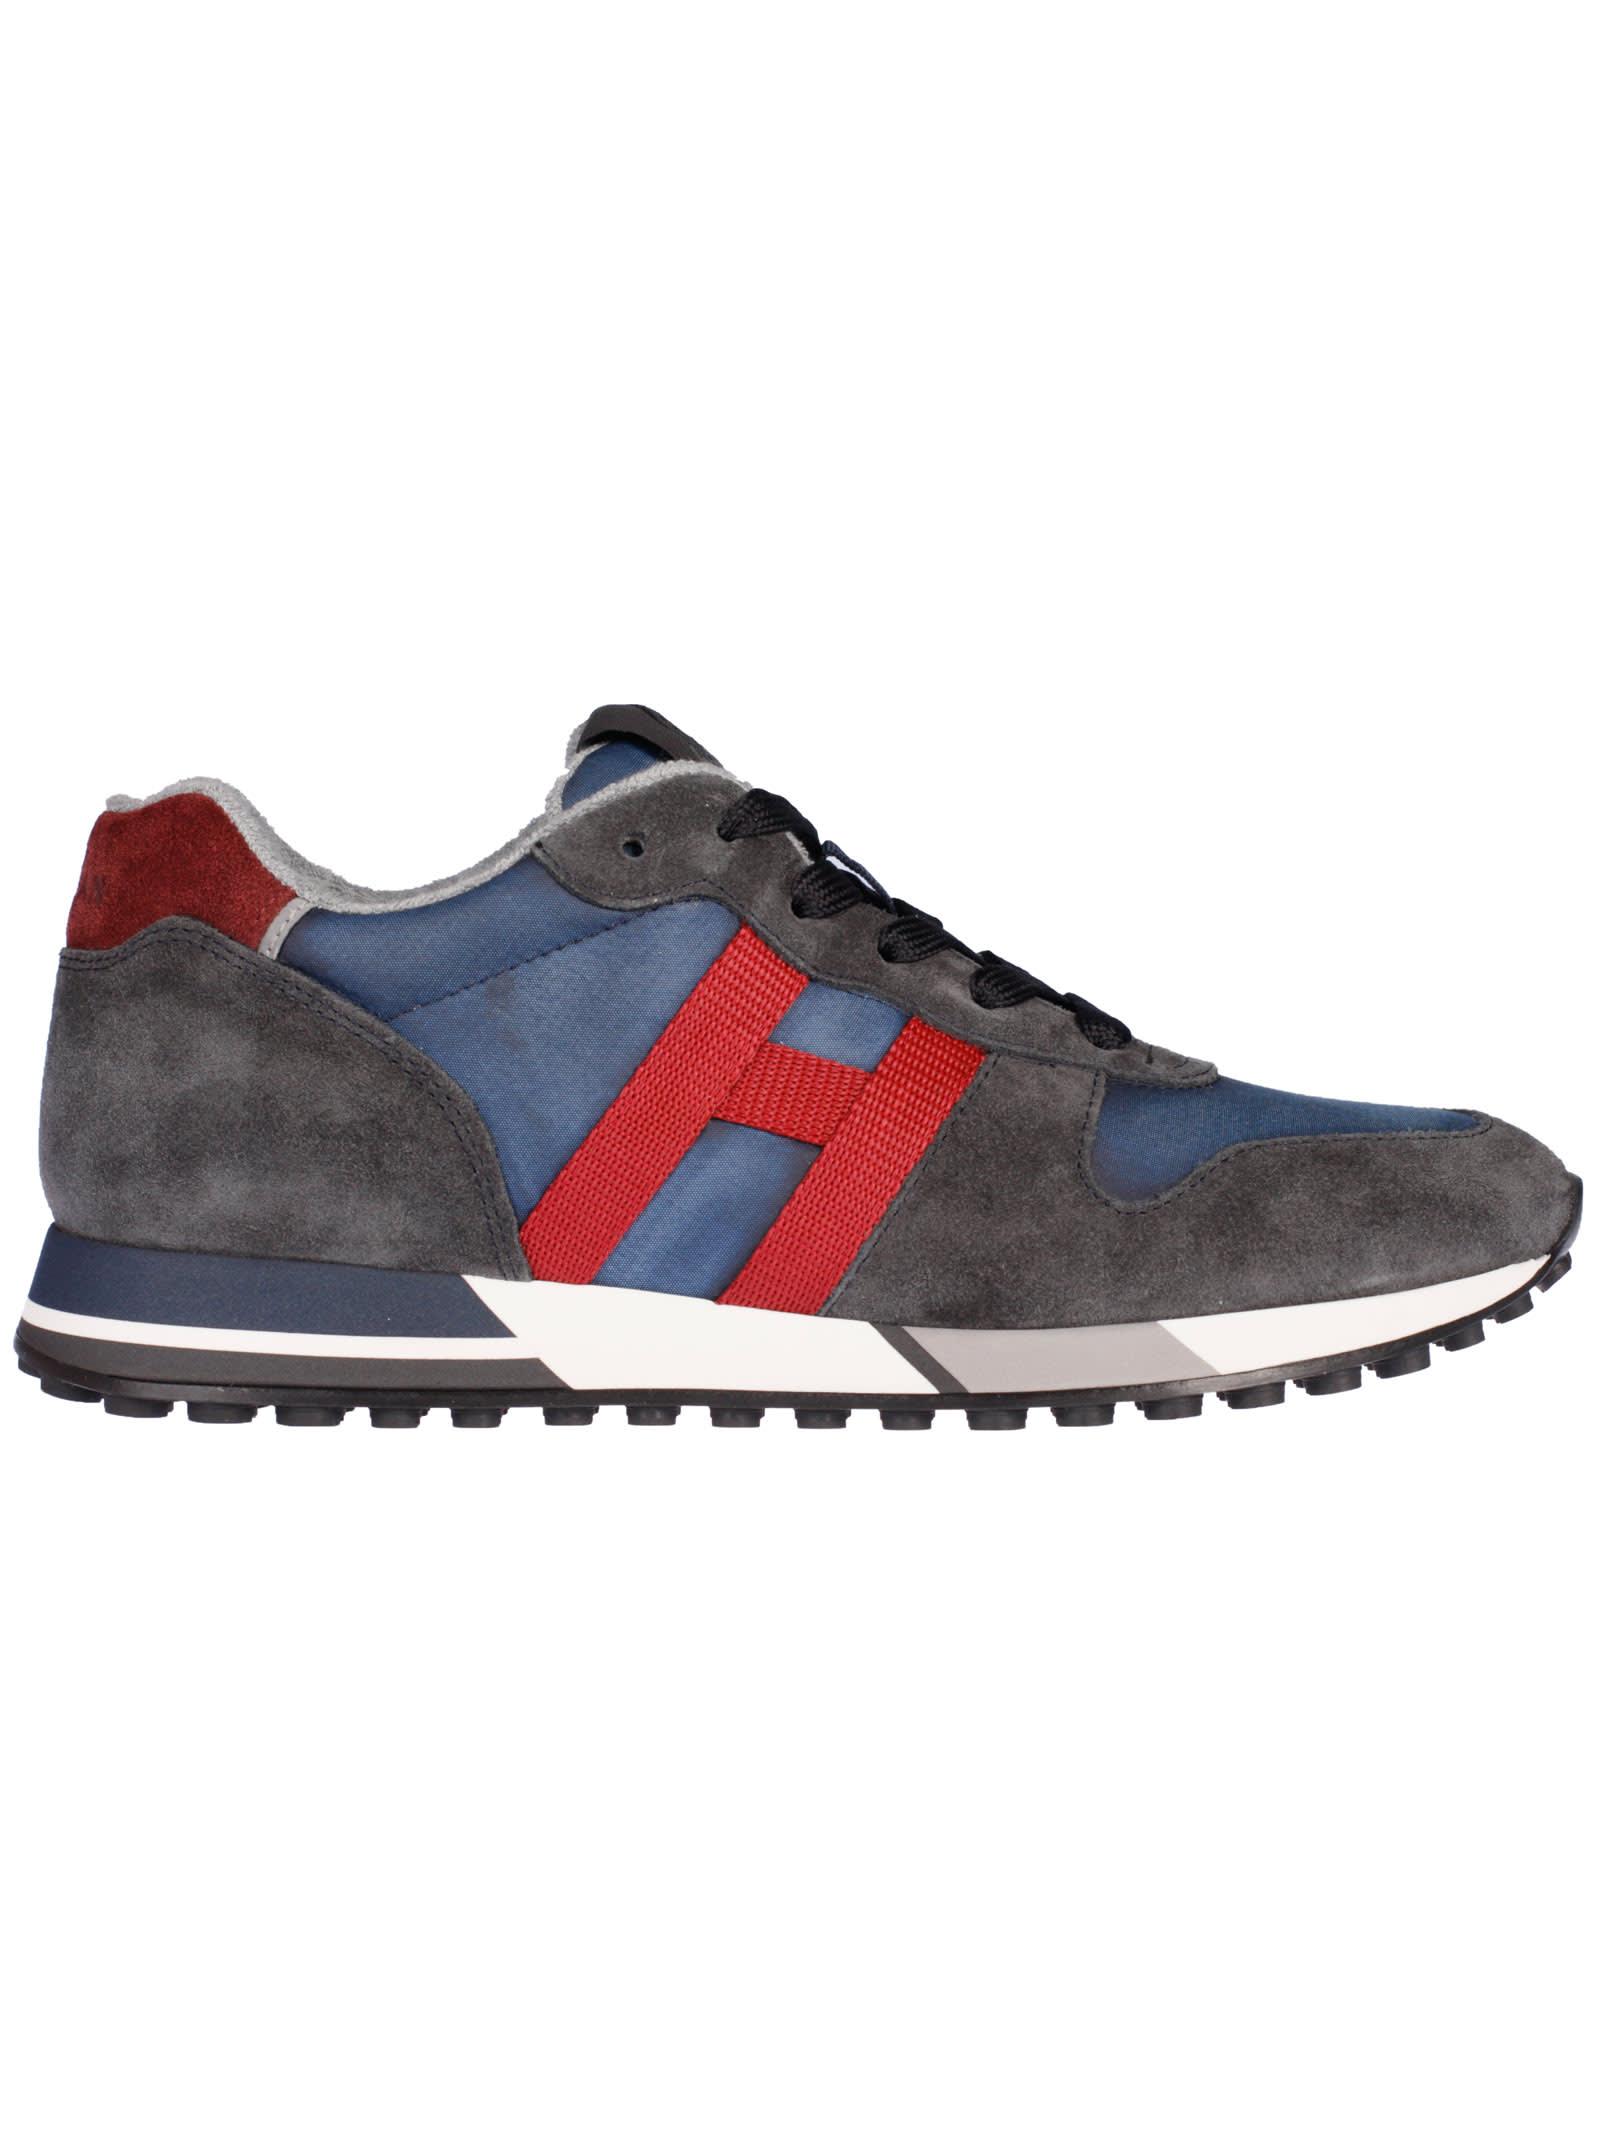 2hogan h383 blu